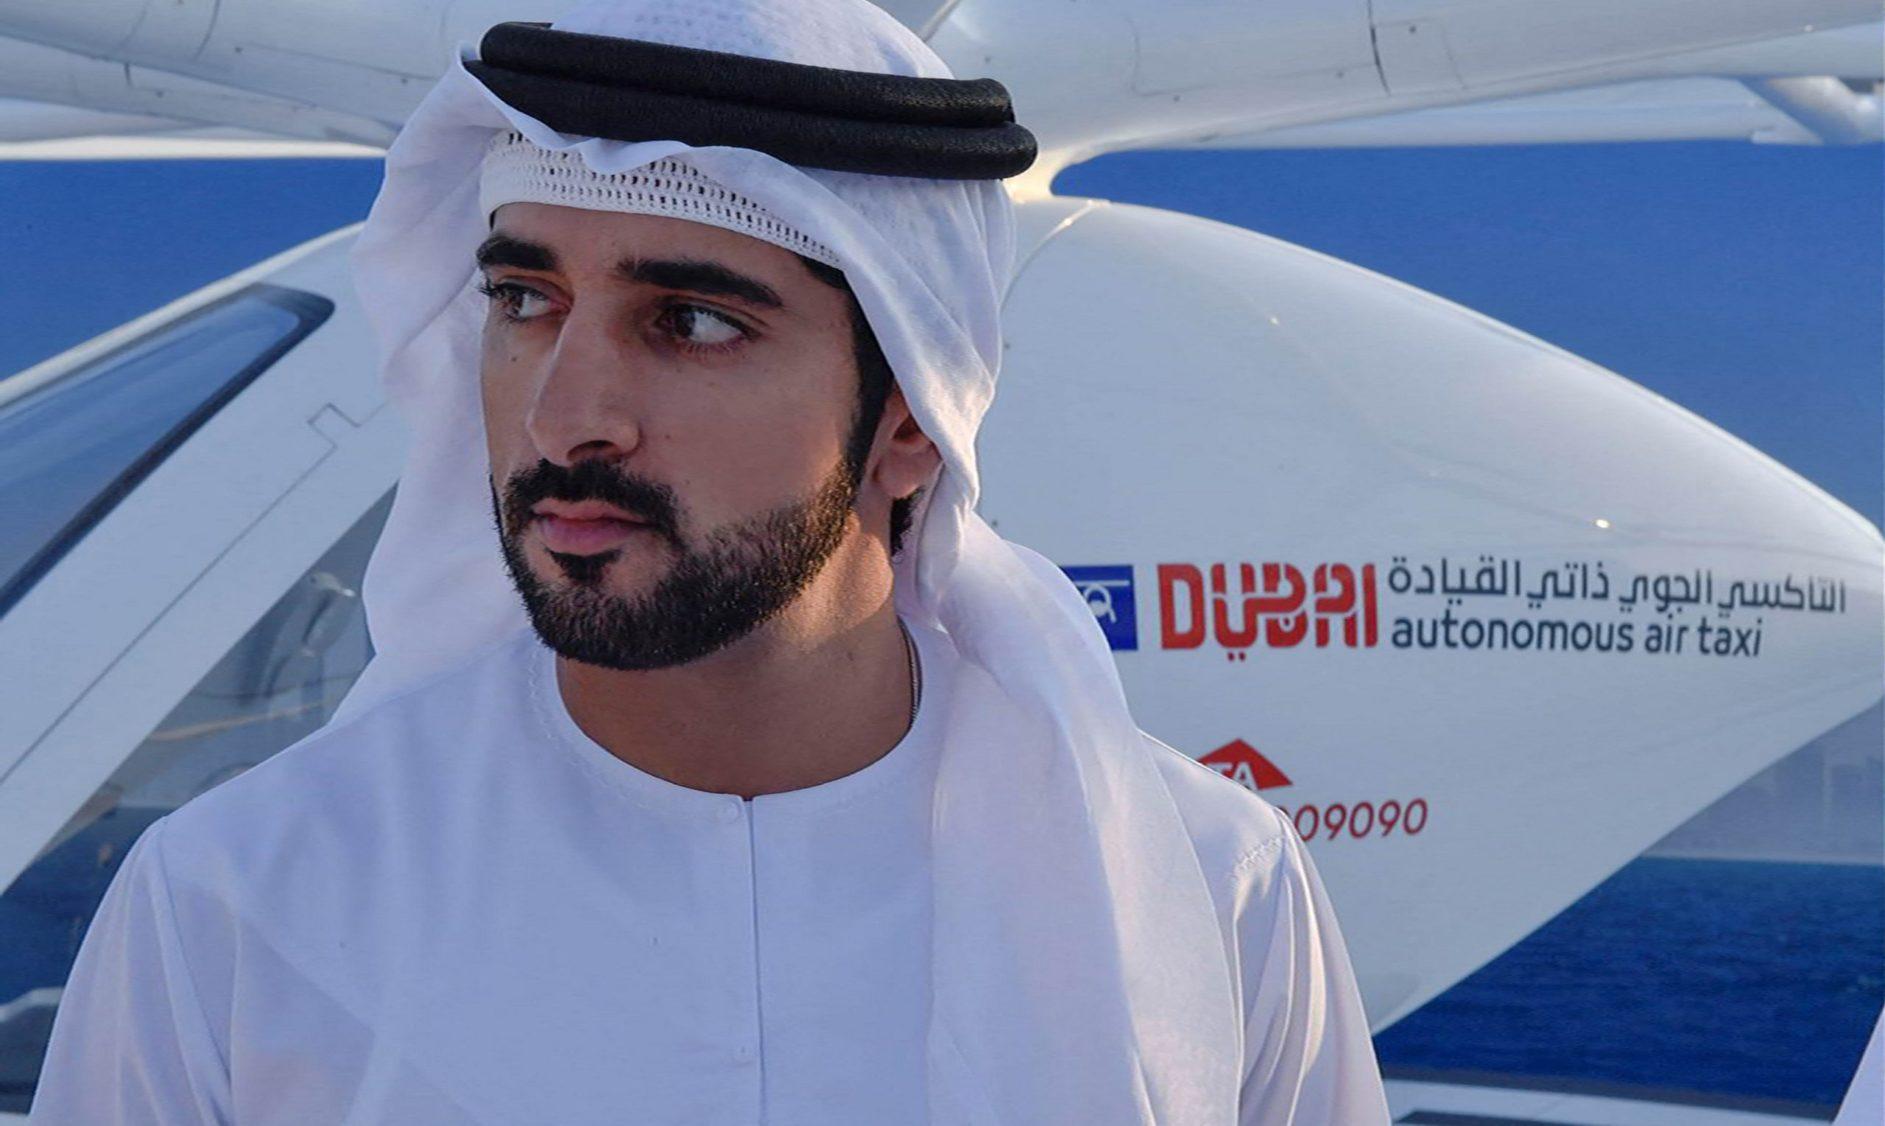 Prince Hamdan of Dubai royal cars